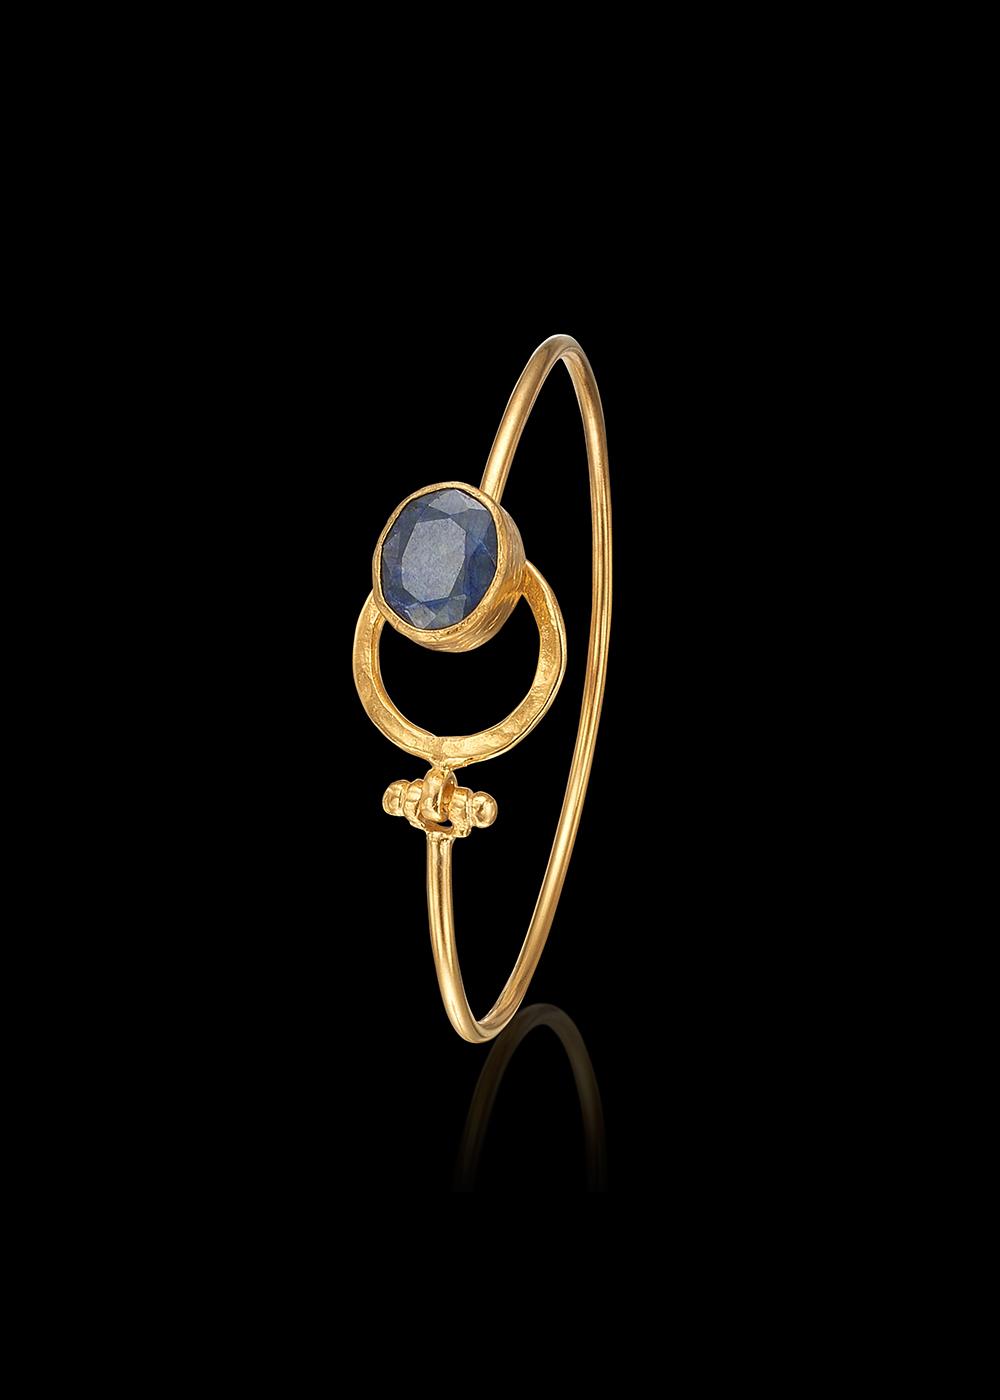 KYBRA bracelet with Sapphire